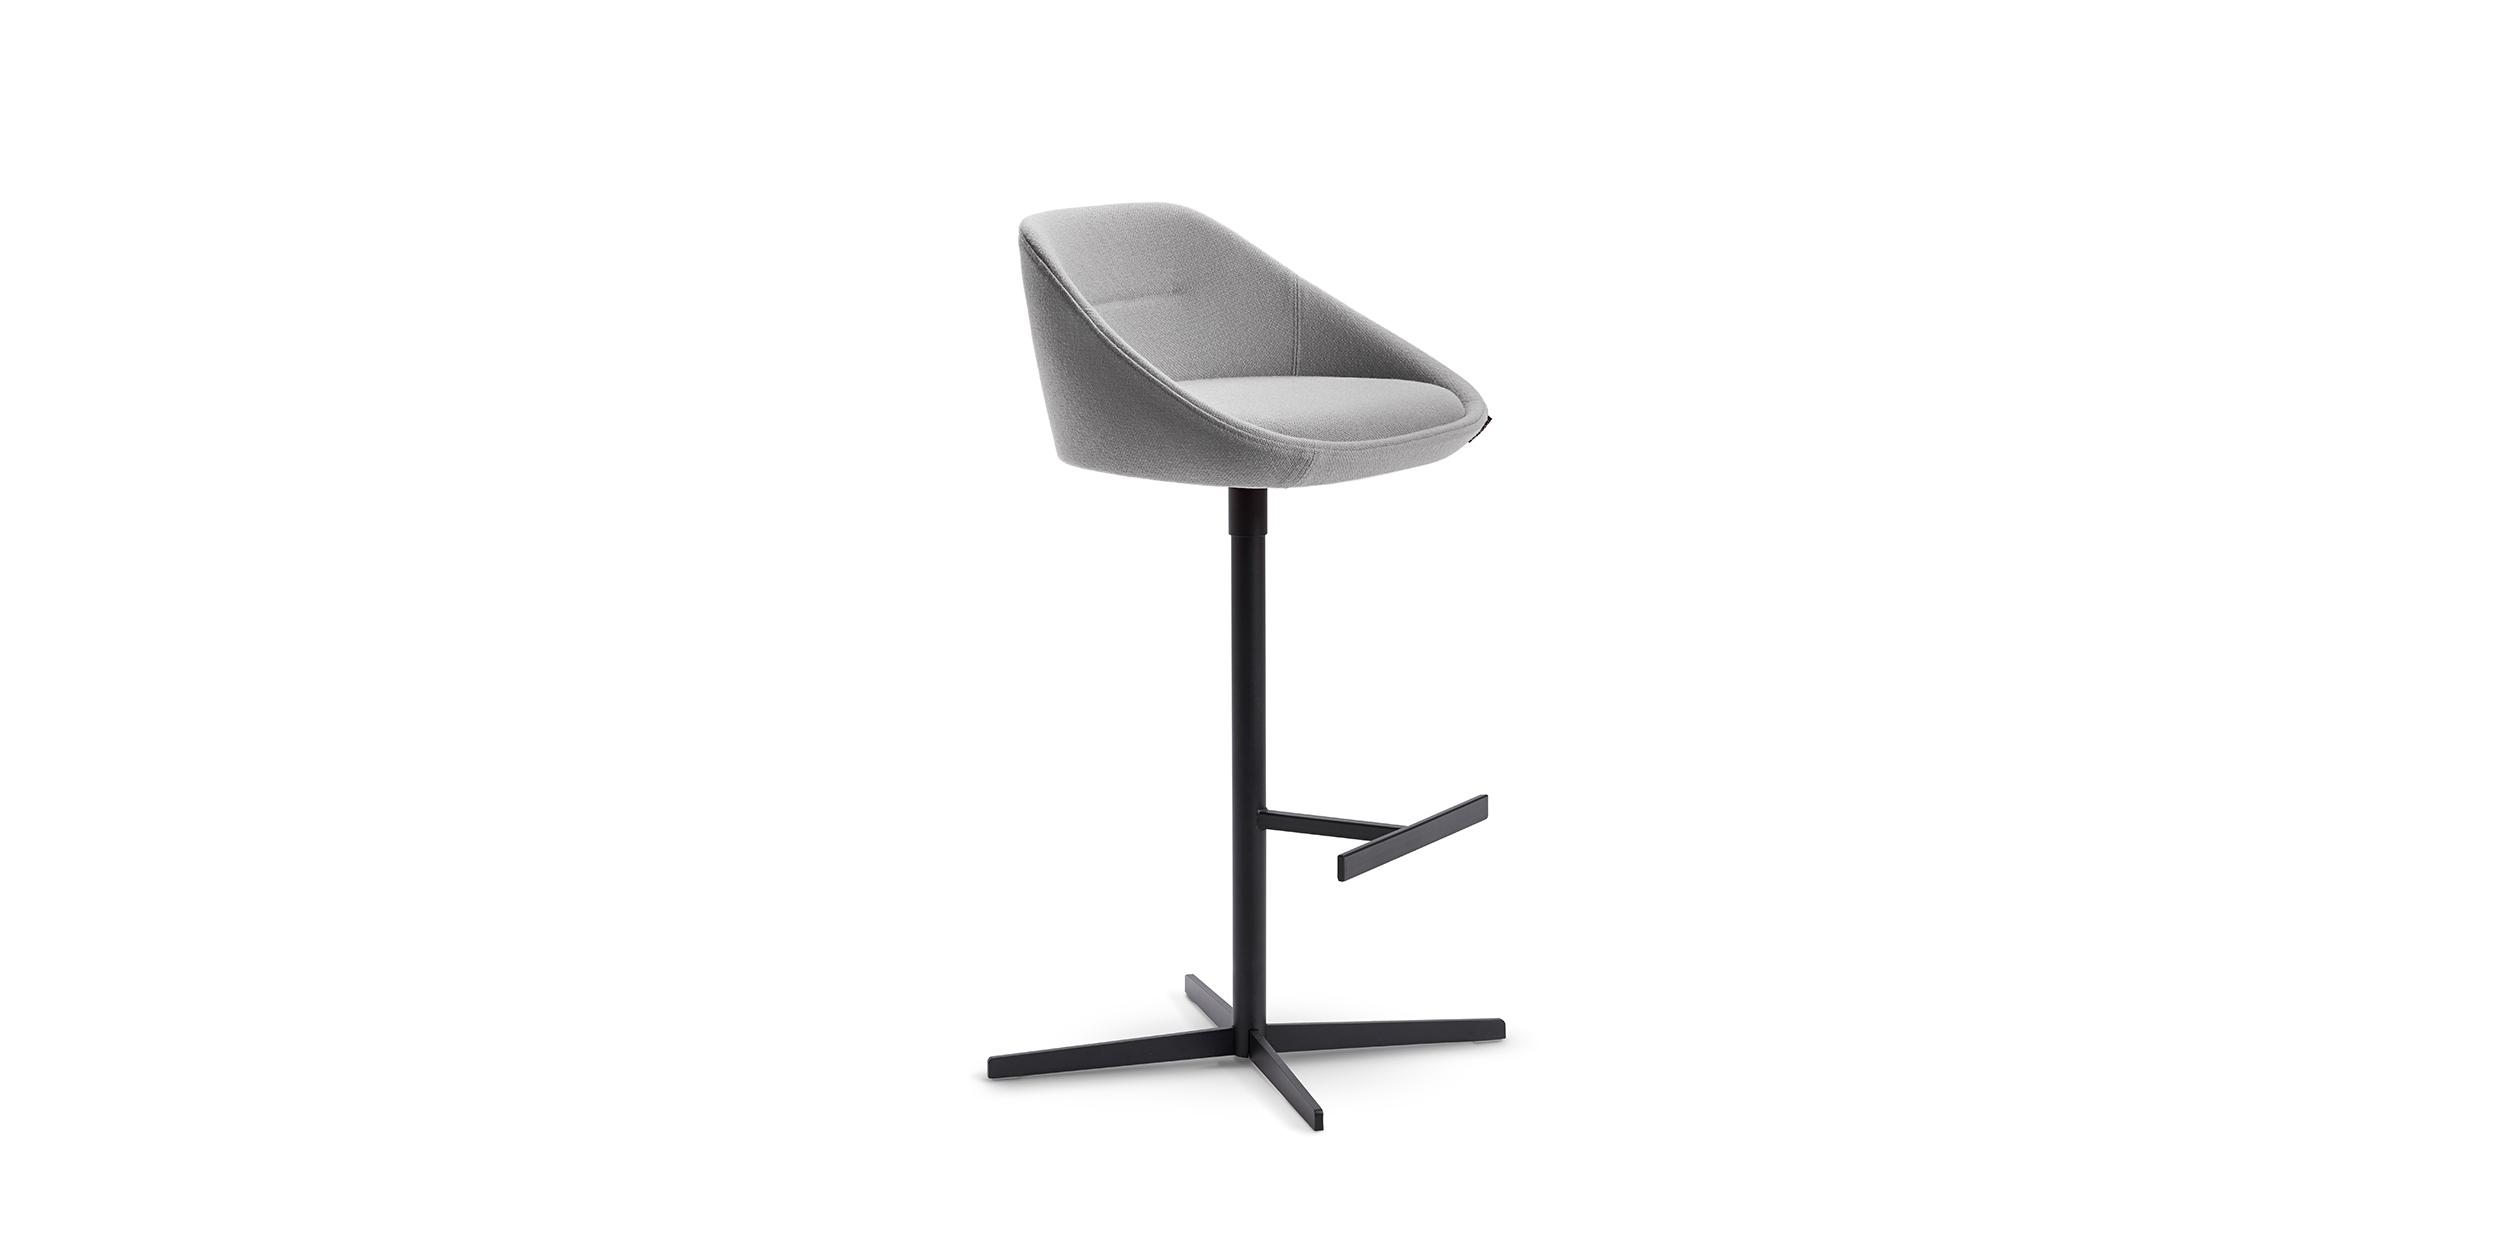 Ezy, Bar stool by Christophe Pillet